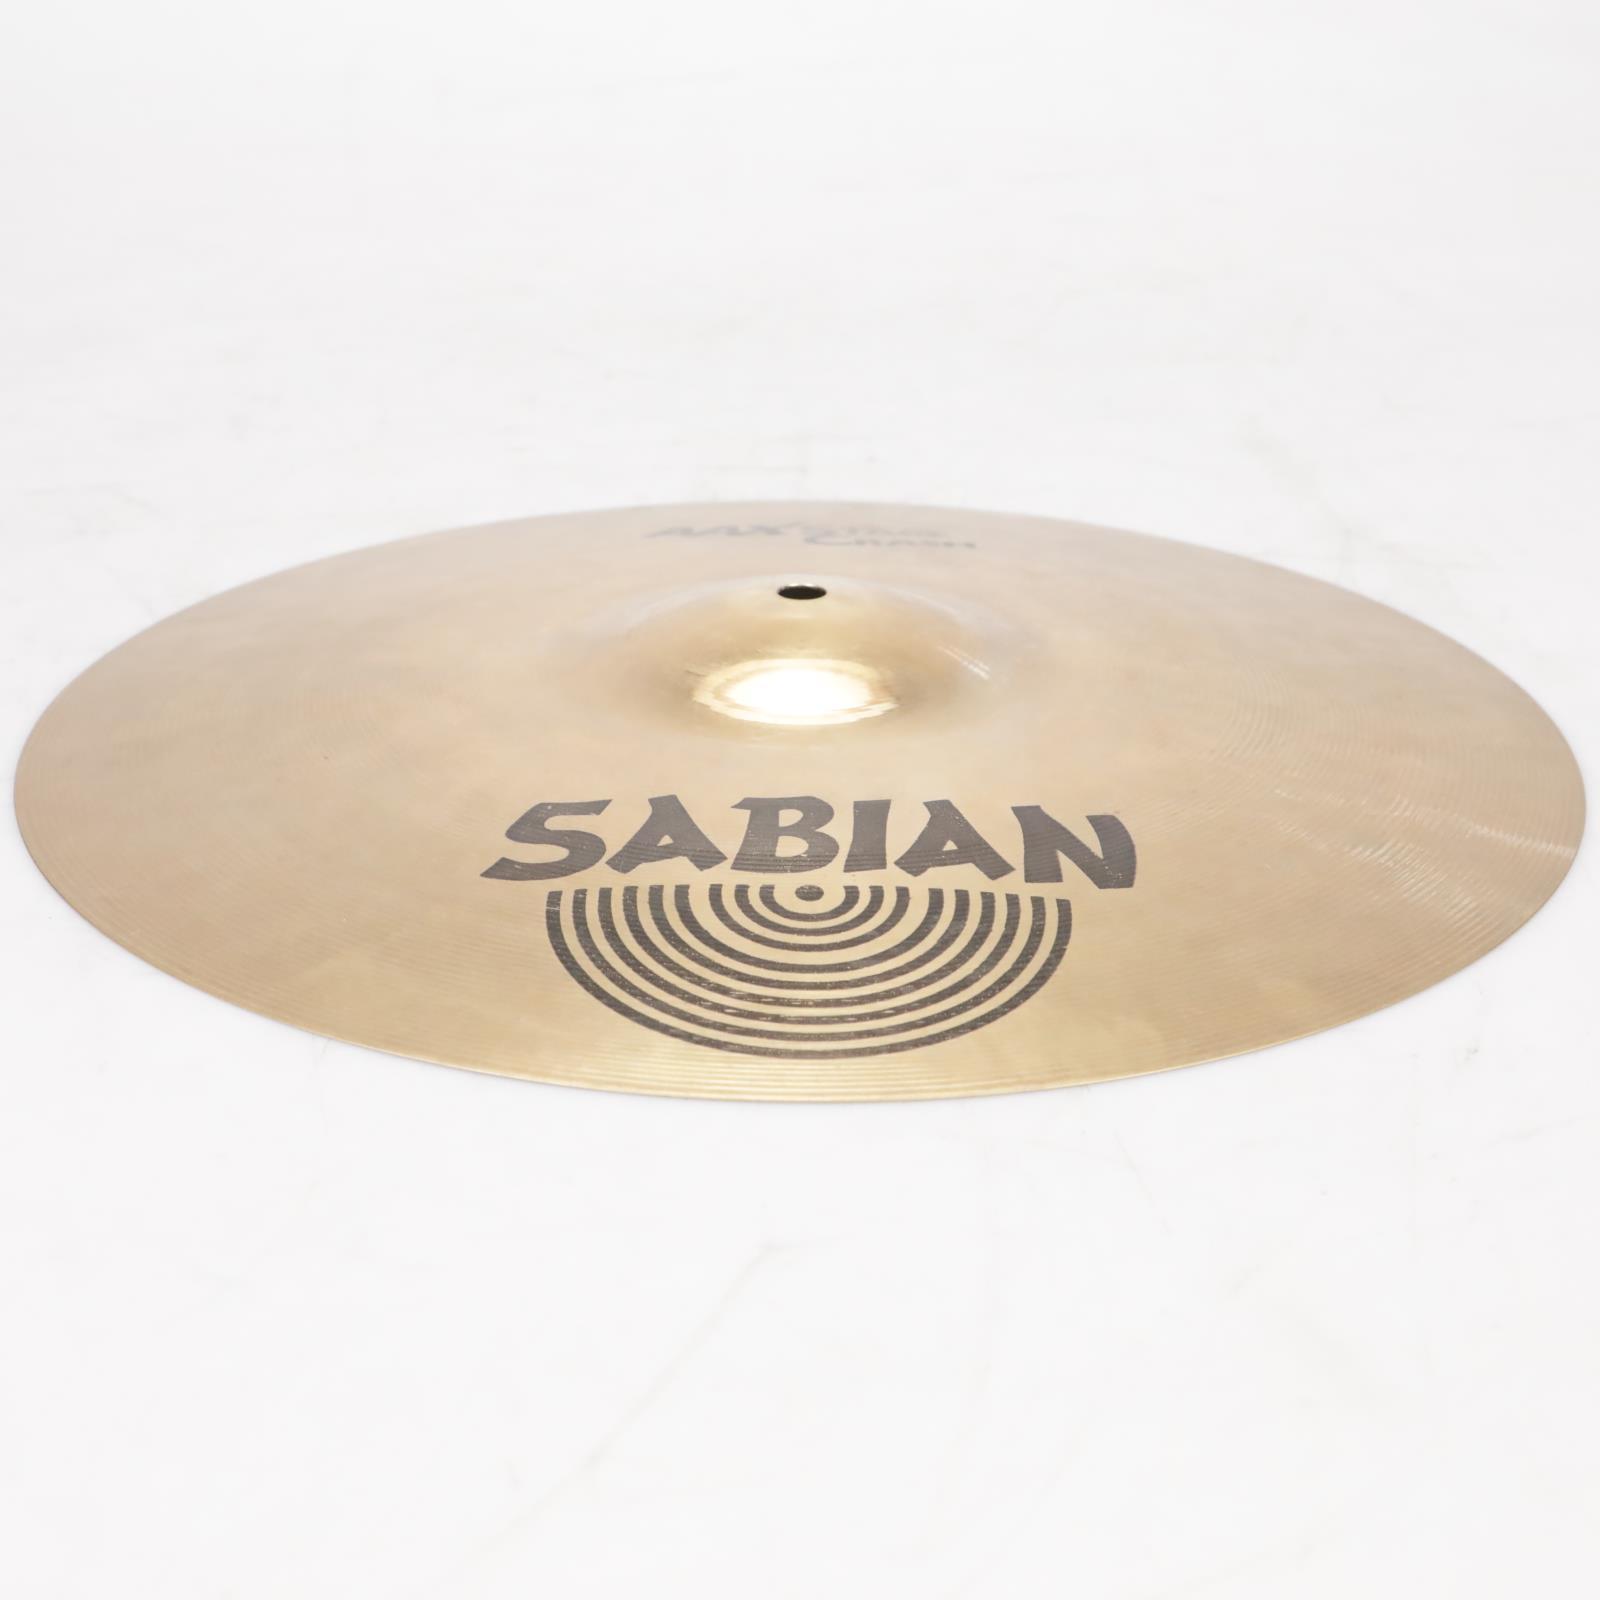 "16"" Sabian AAX Stage Crash Cymbal Drums #38580"